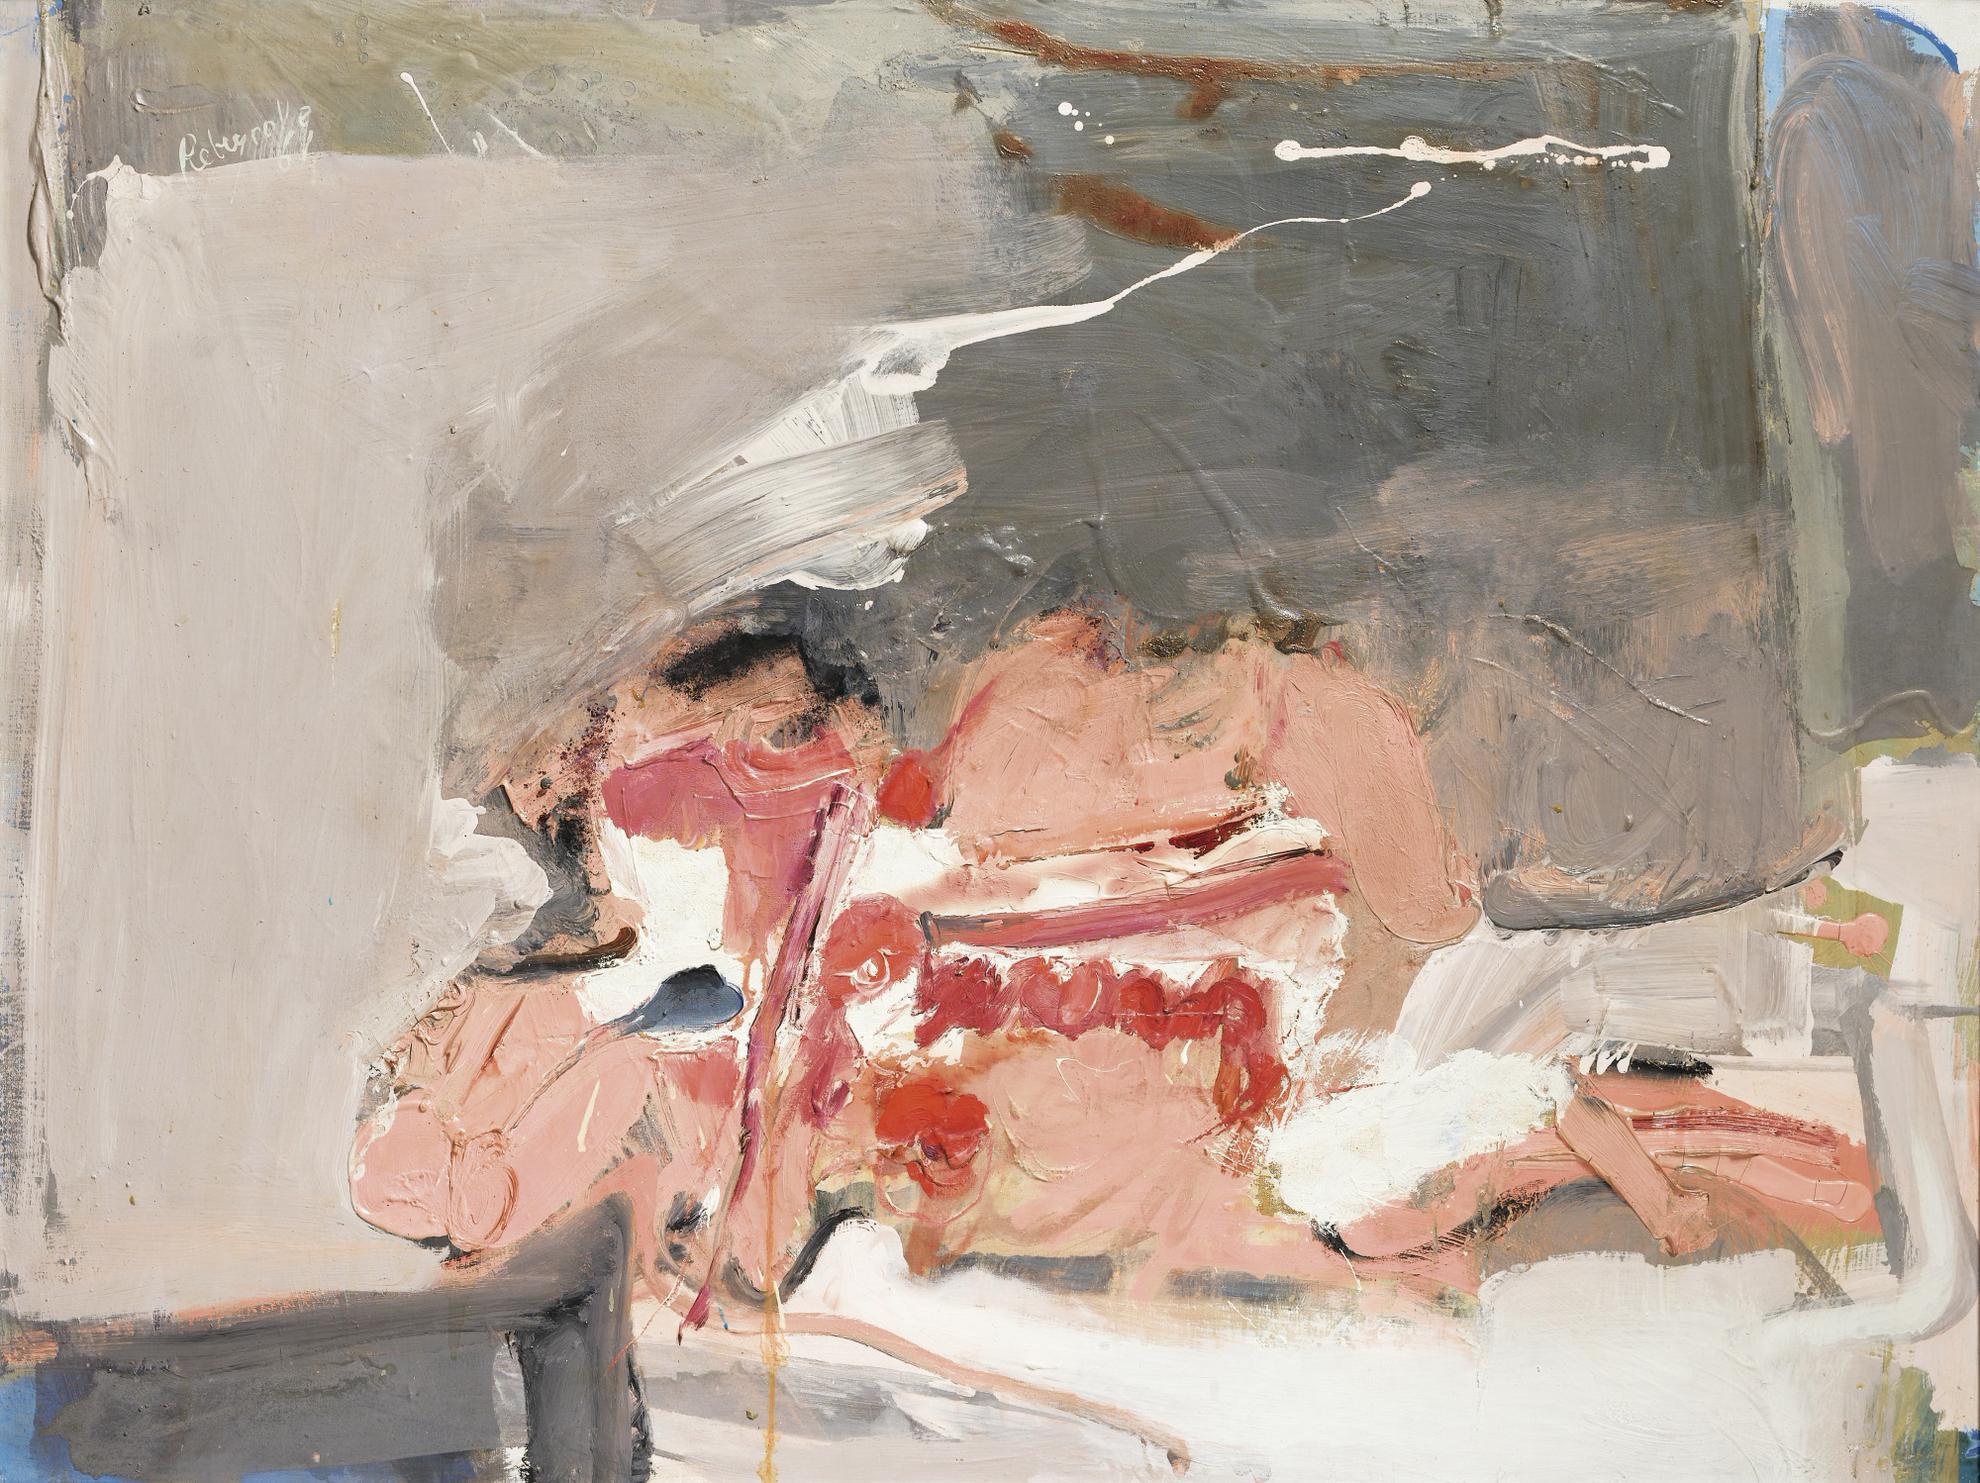 Paul Rebeyrolle - Couple-1961